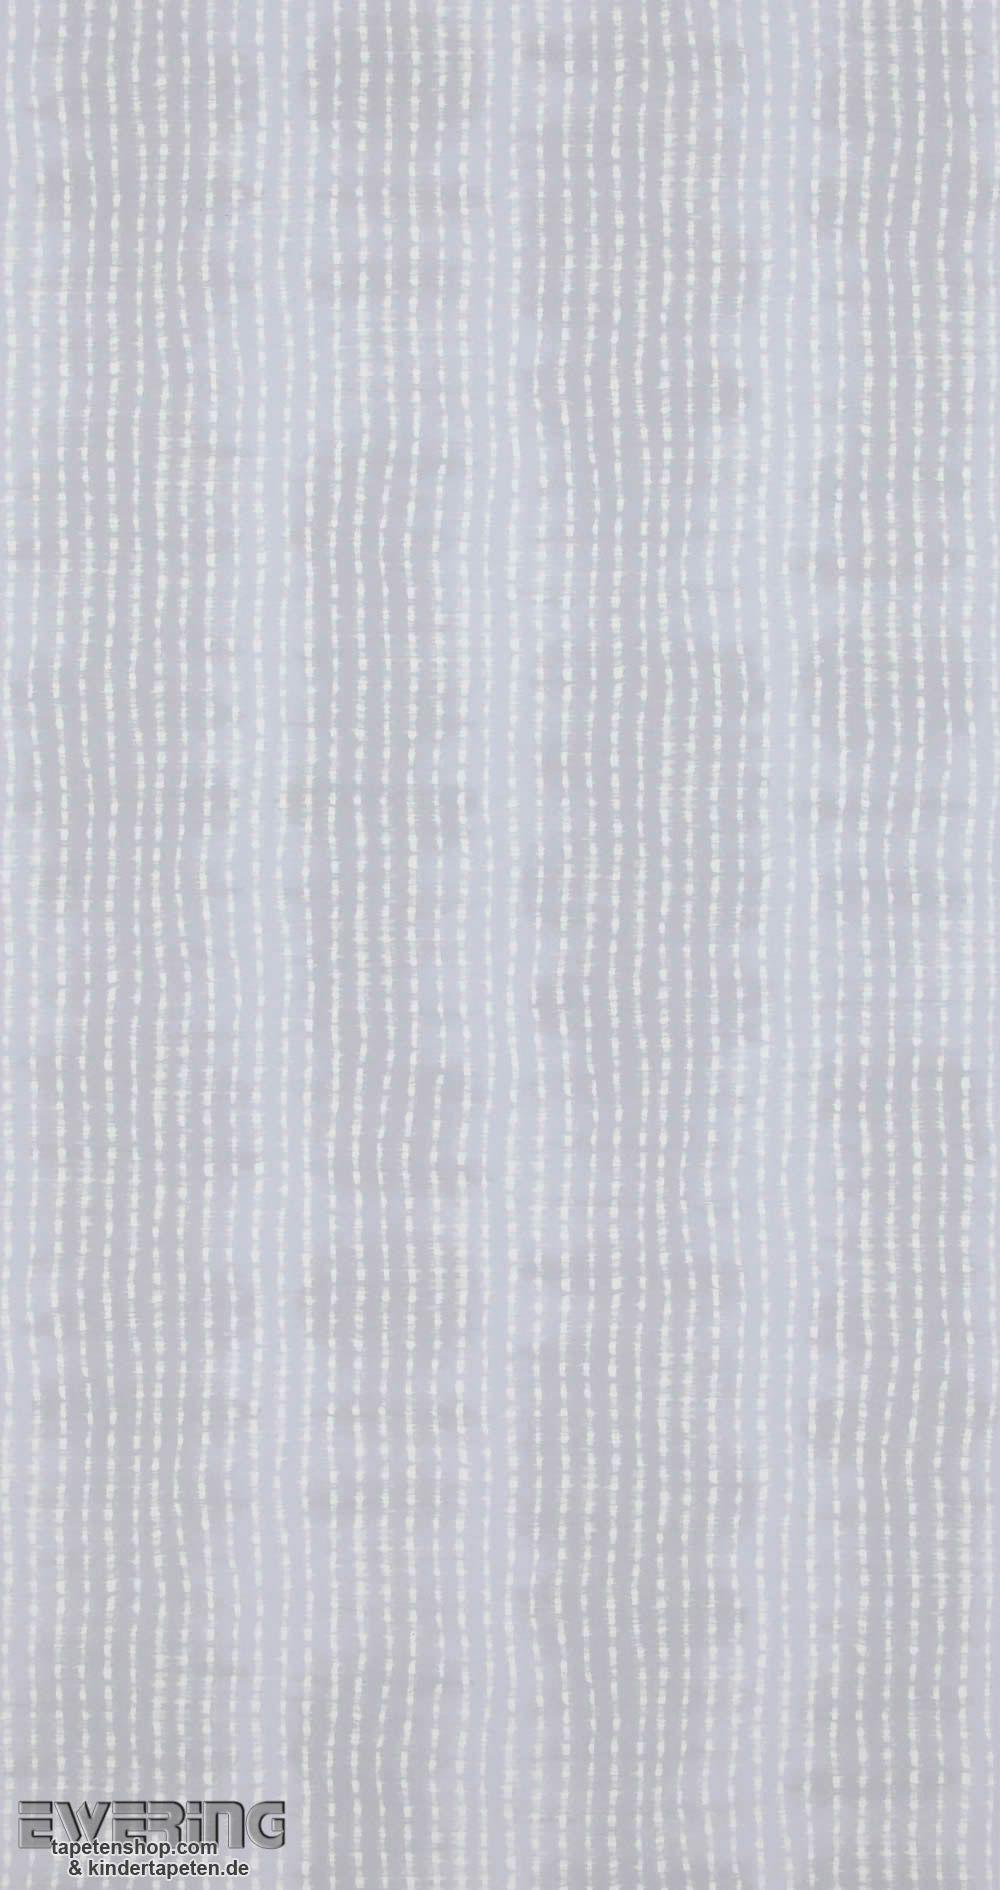 Bn Tapeten Nomadics 12 17272 Streifen Vliestapete Tauben Blau